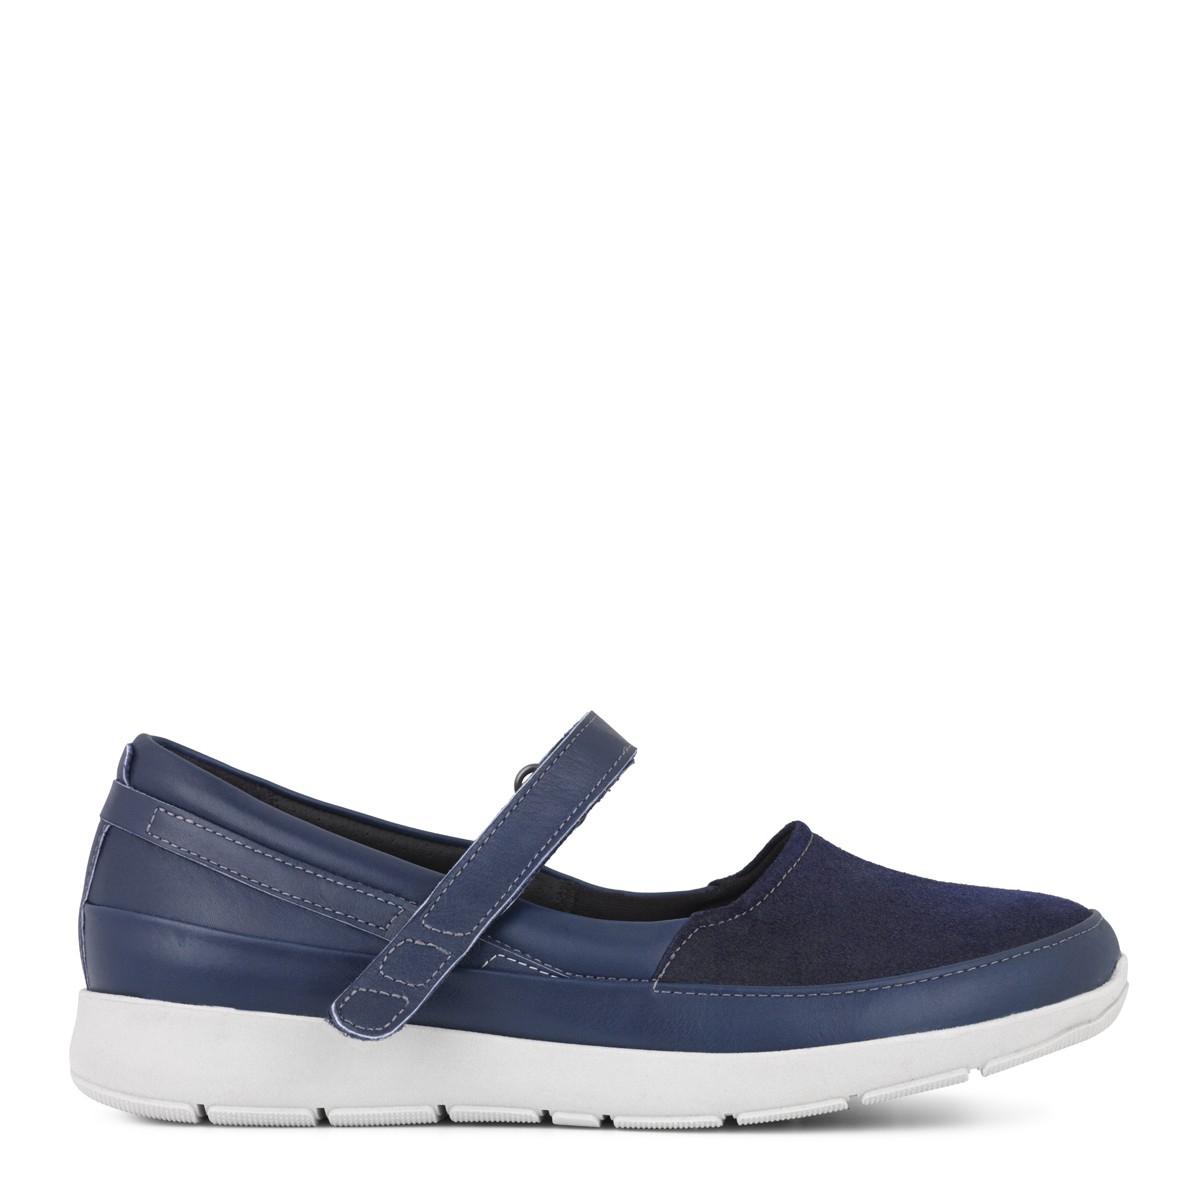 New Feet ballerina i blå strækskind fra